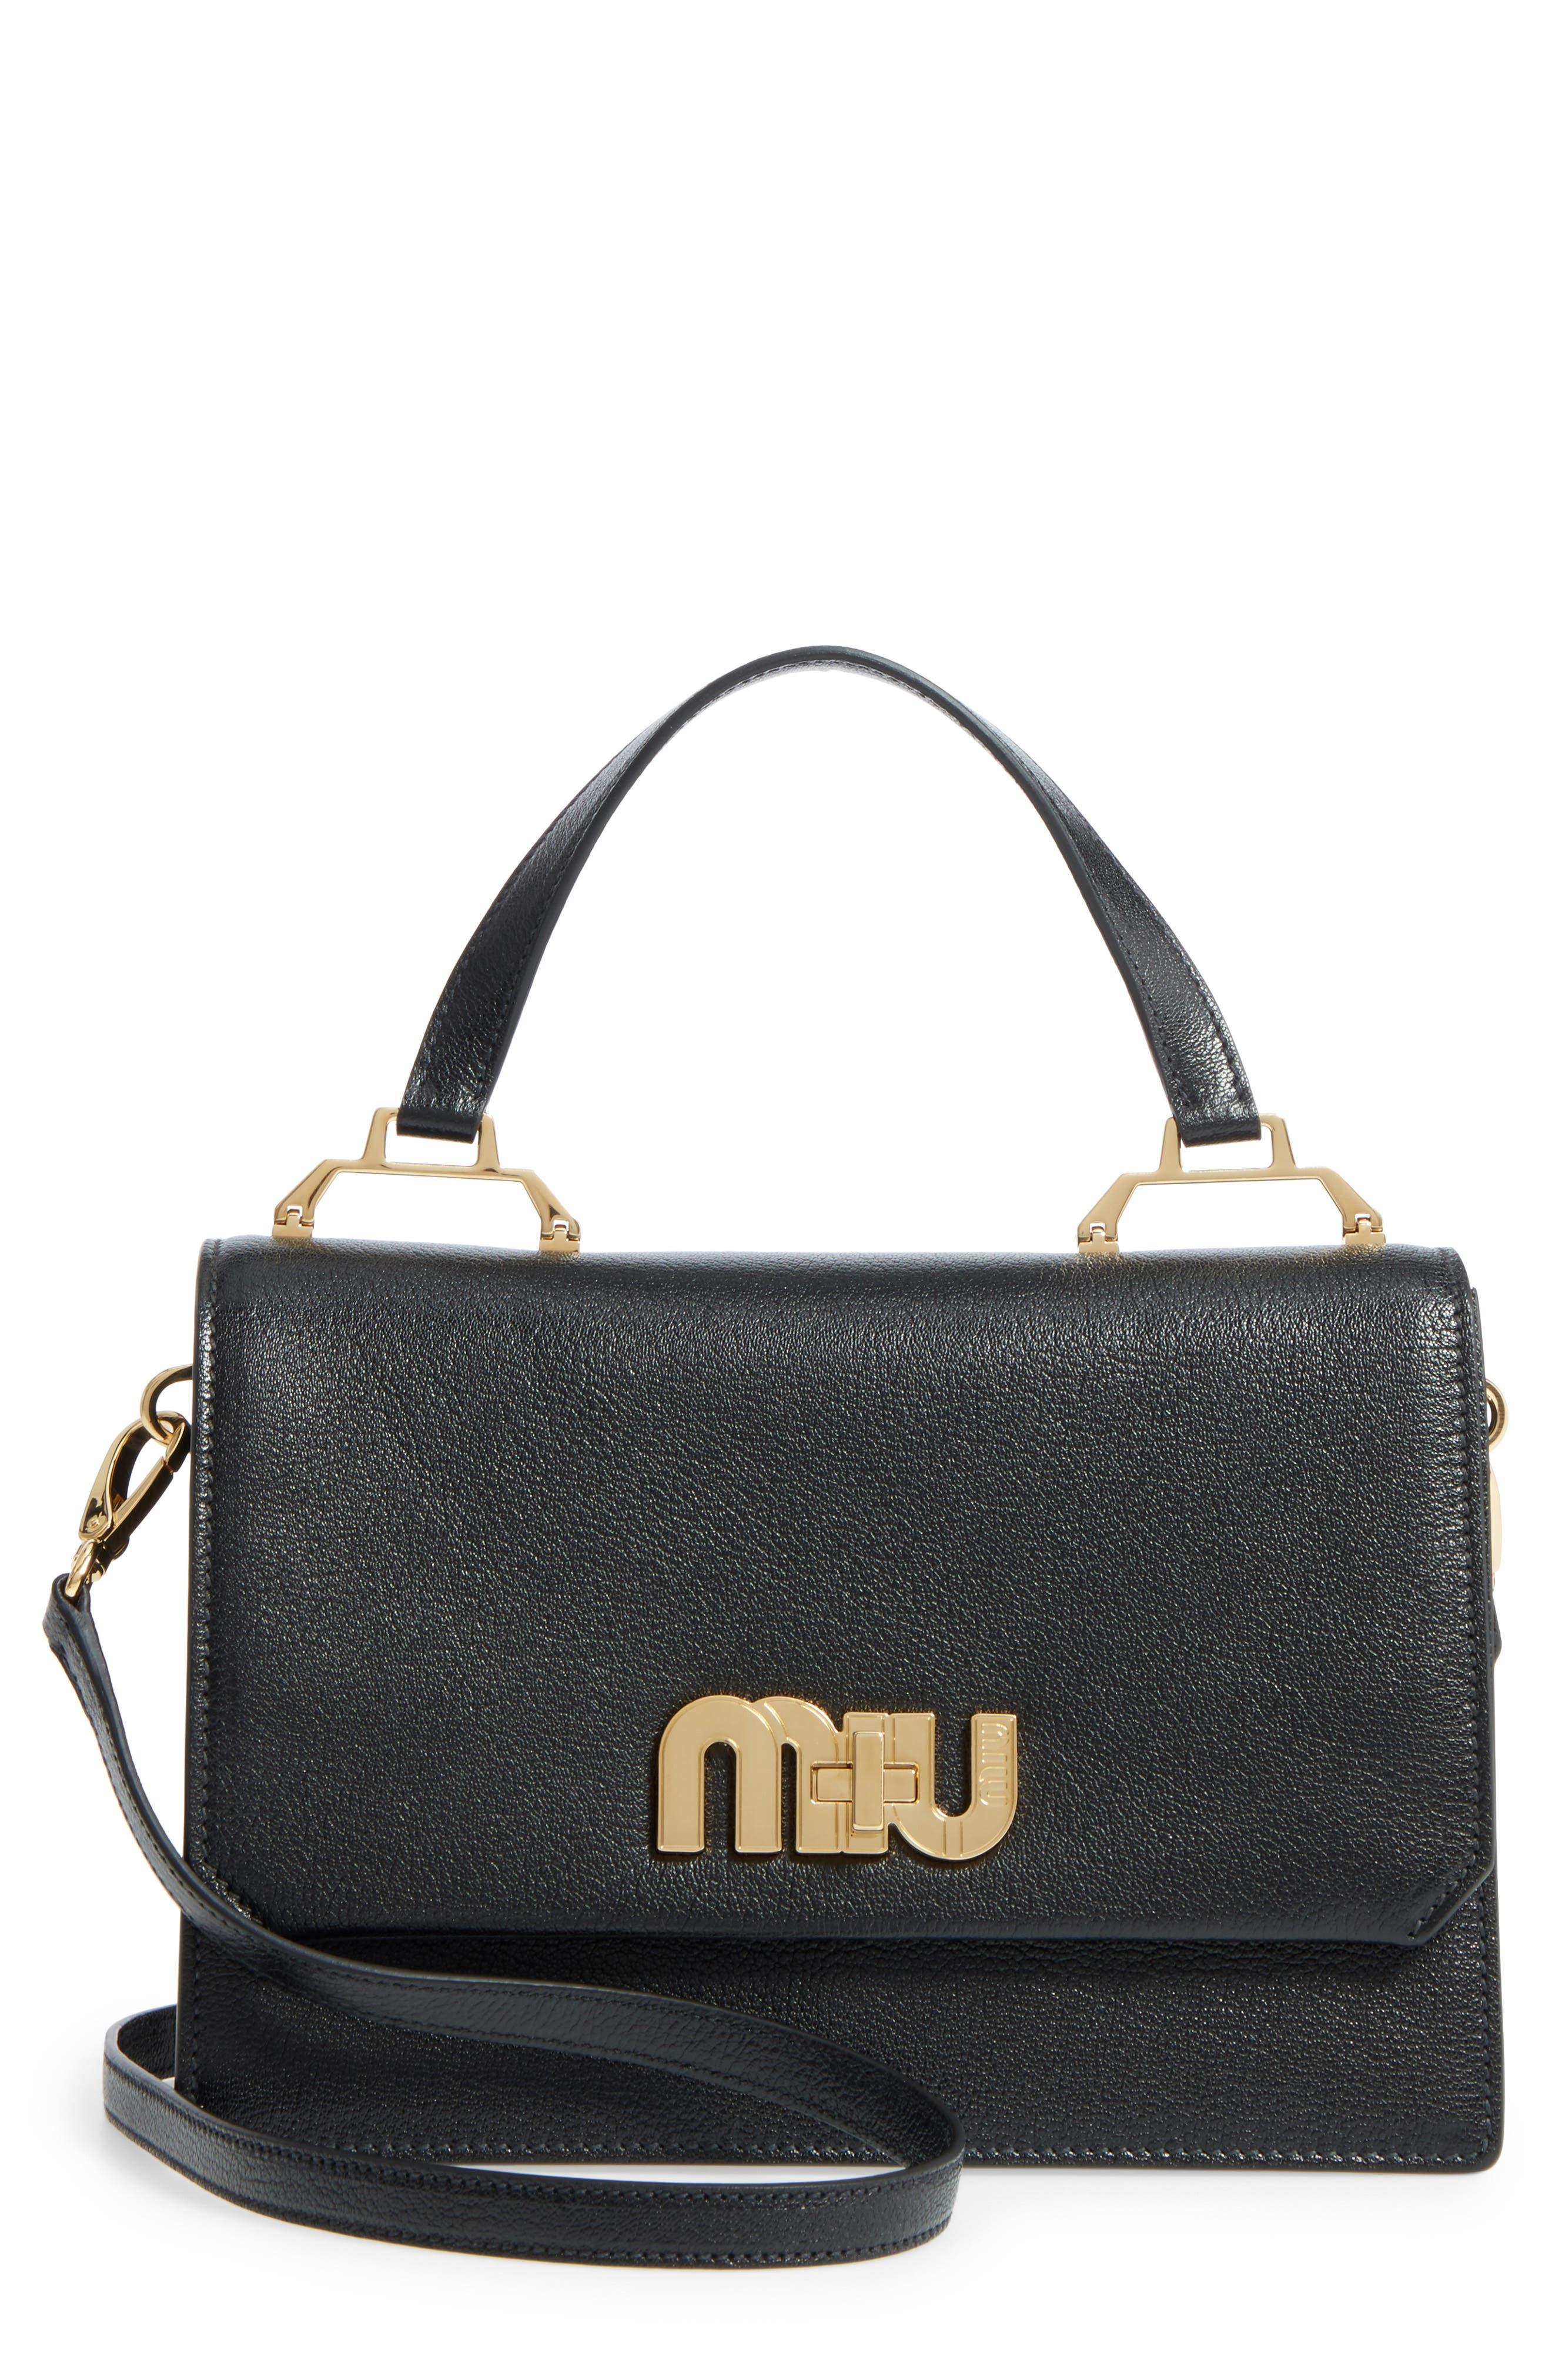 Miu Miu Medium Madras Logo Hardware Leather Satchel